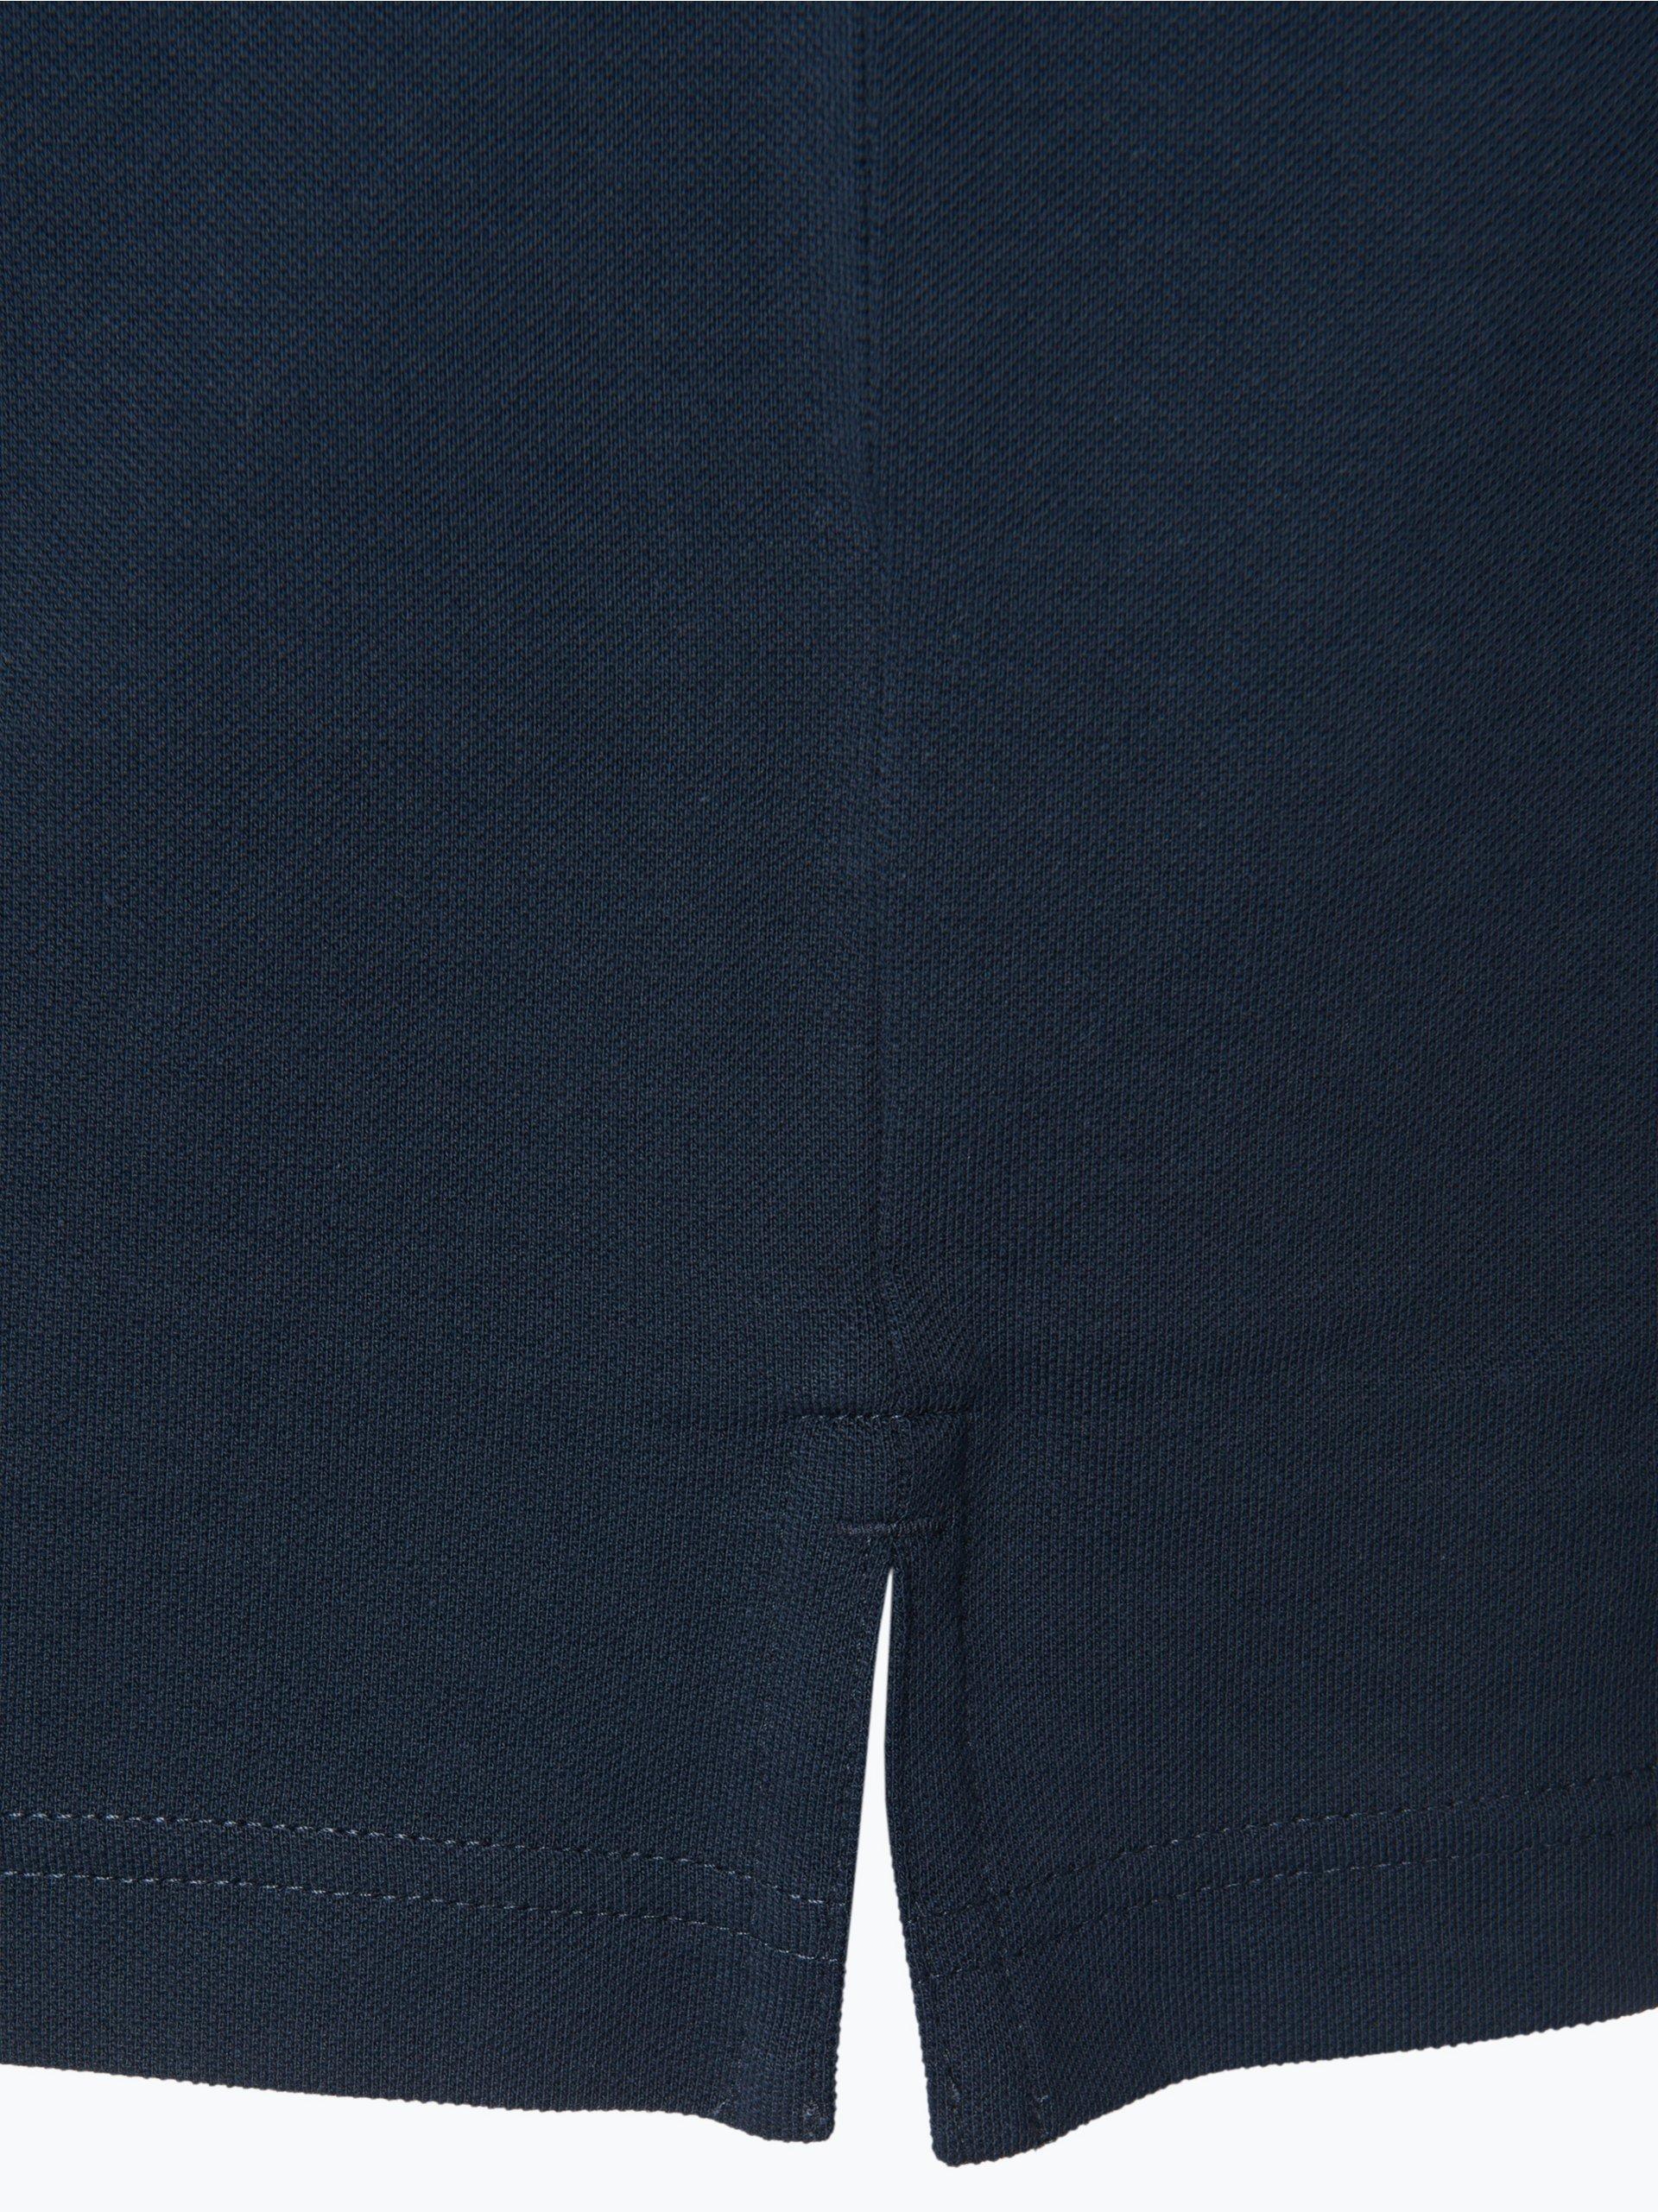 BOSS Menswear Athleisure Męska koszulka polo – C-Firenze/Logo